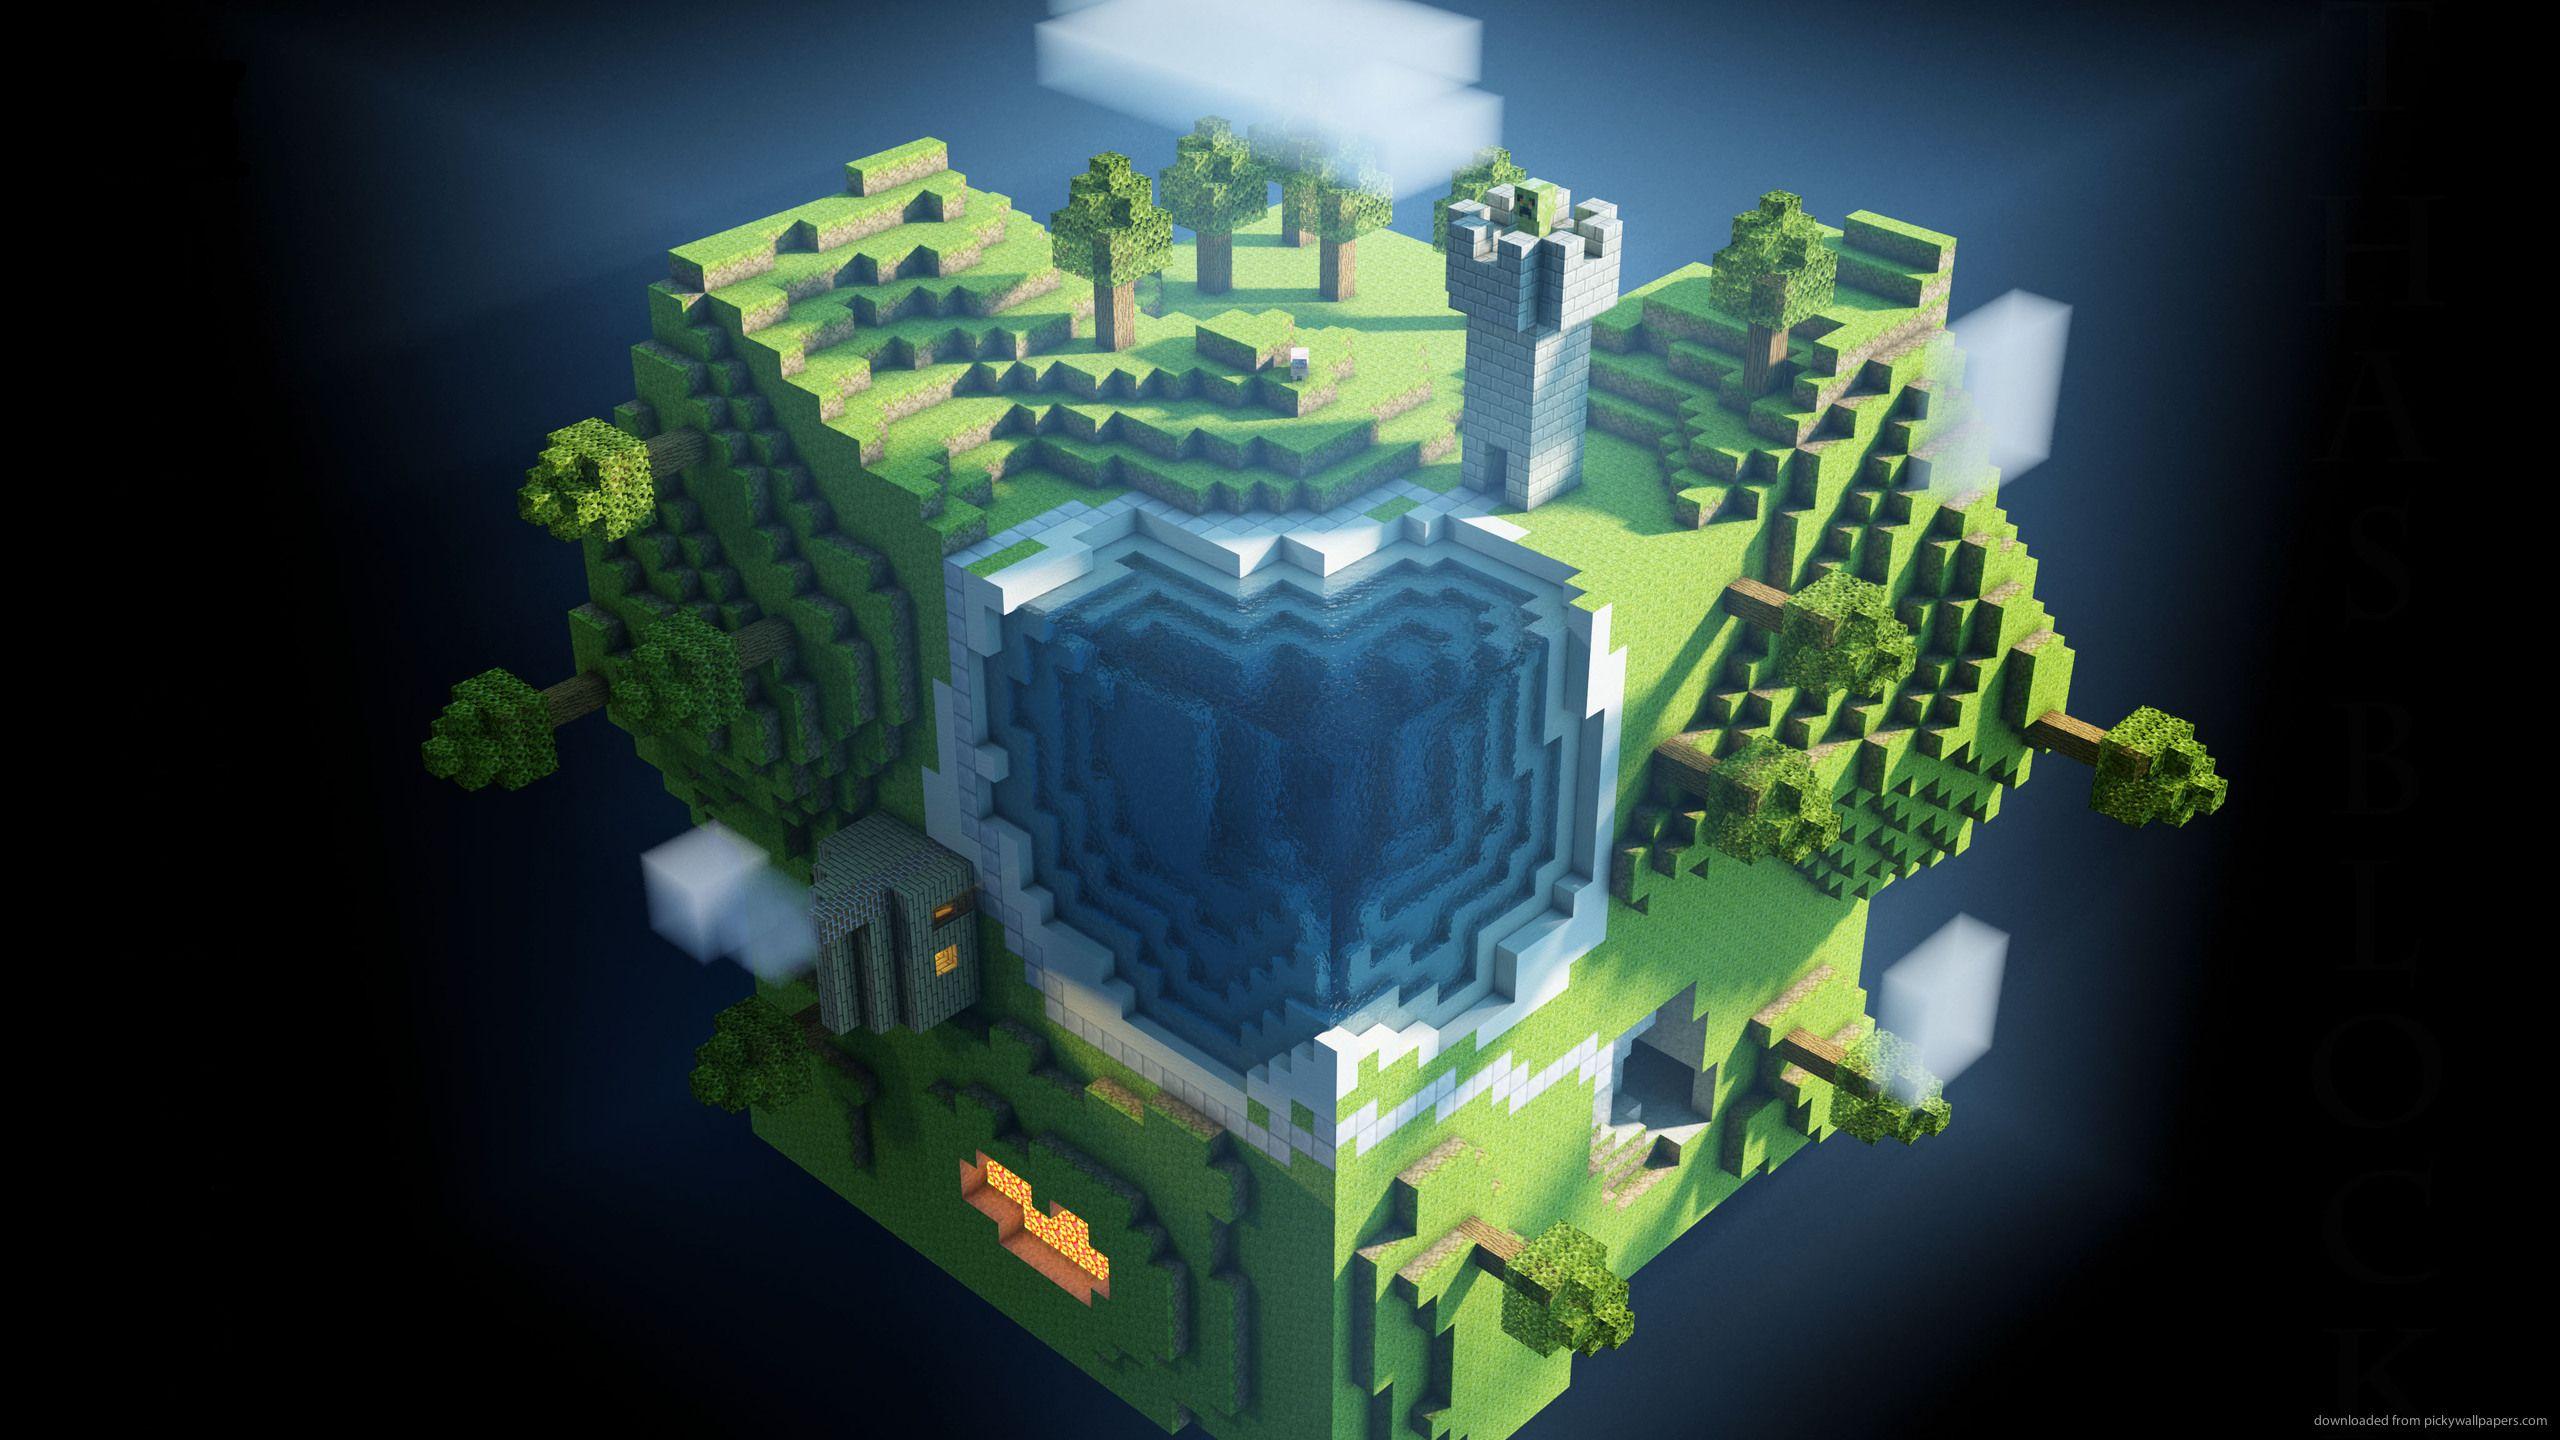 Good Wallpaper Minecraft Universe - 3f45353647c0e29c2904aaad9d16db1b  Best Photo Reference_246977.jpg